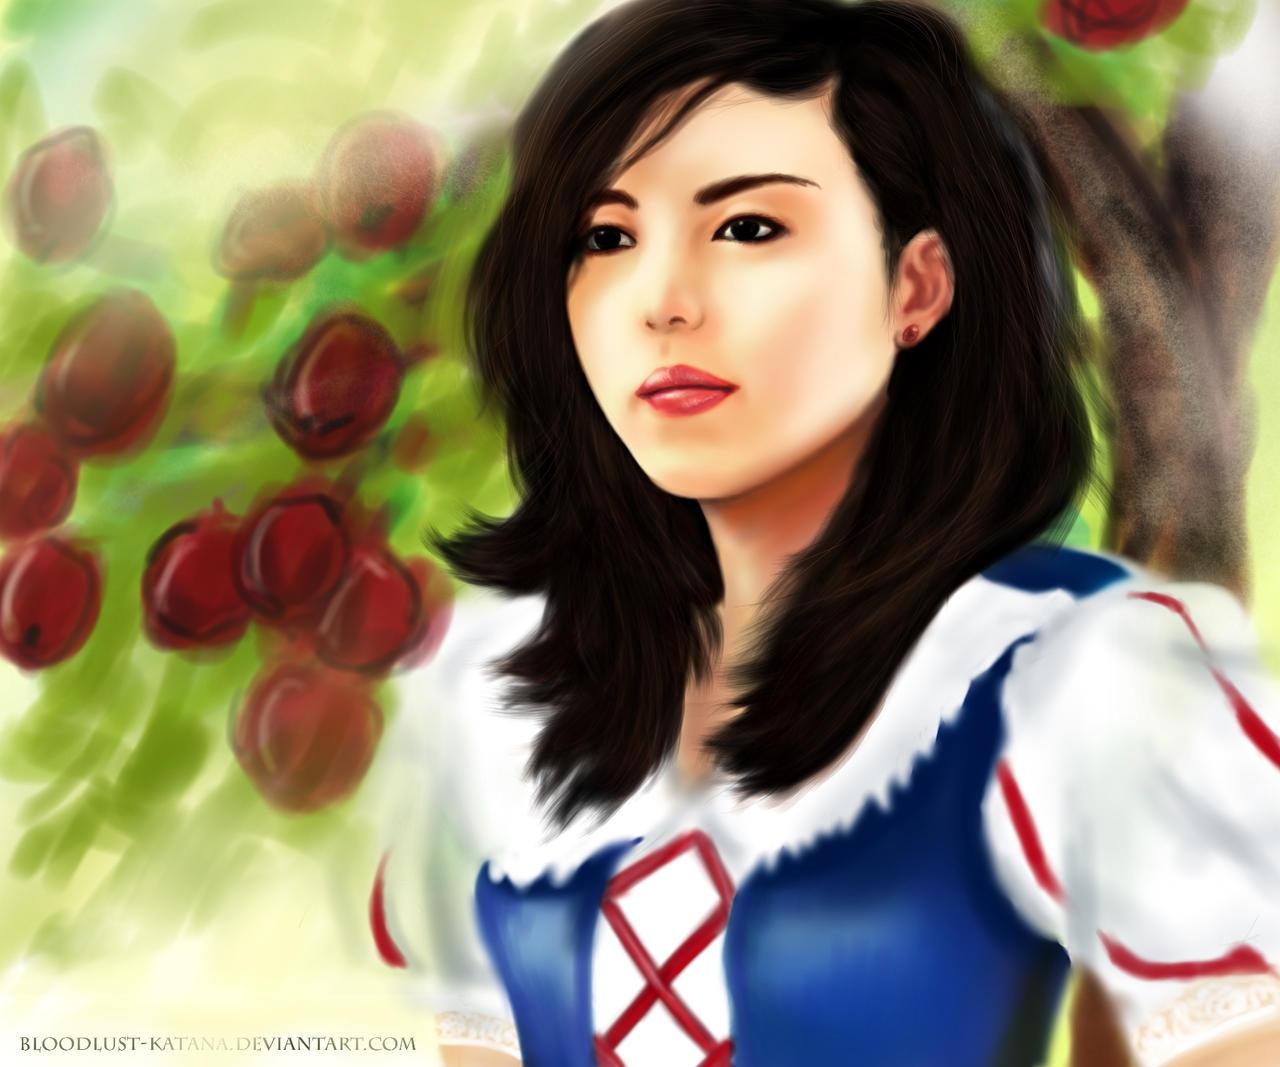 Snow White by bloodlust-katana